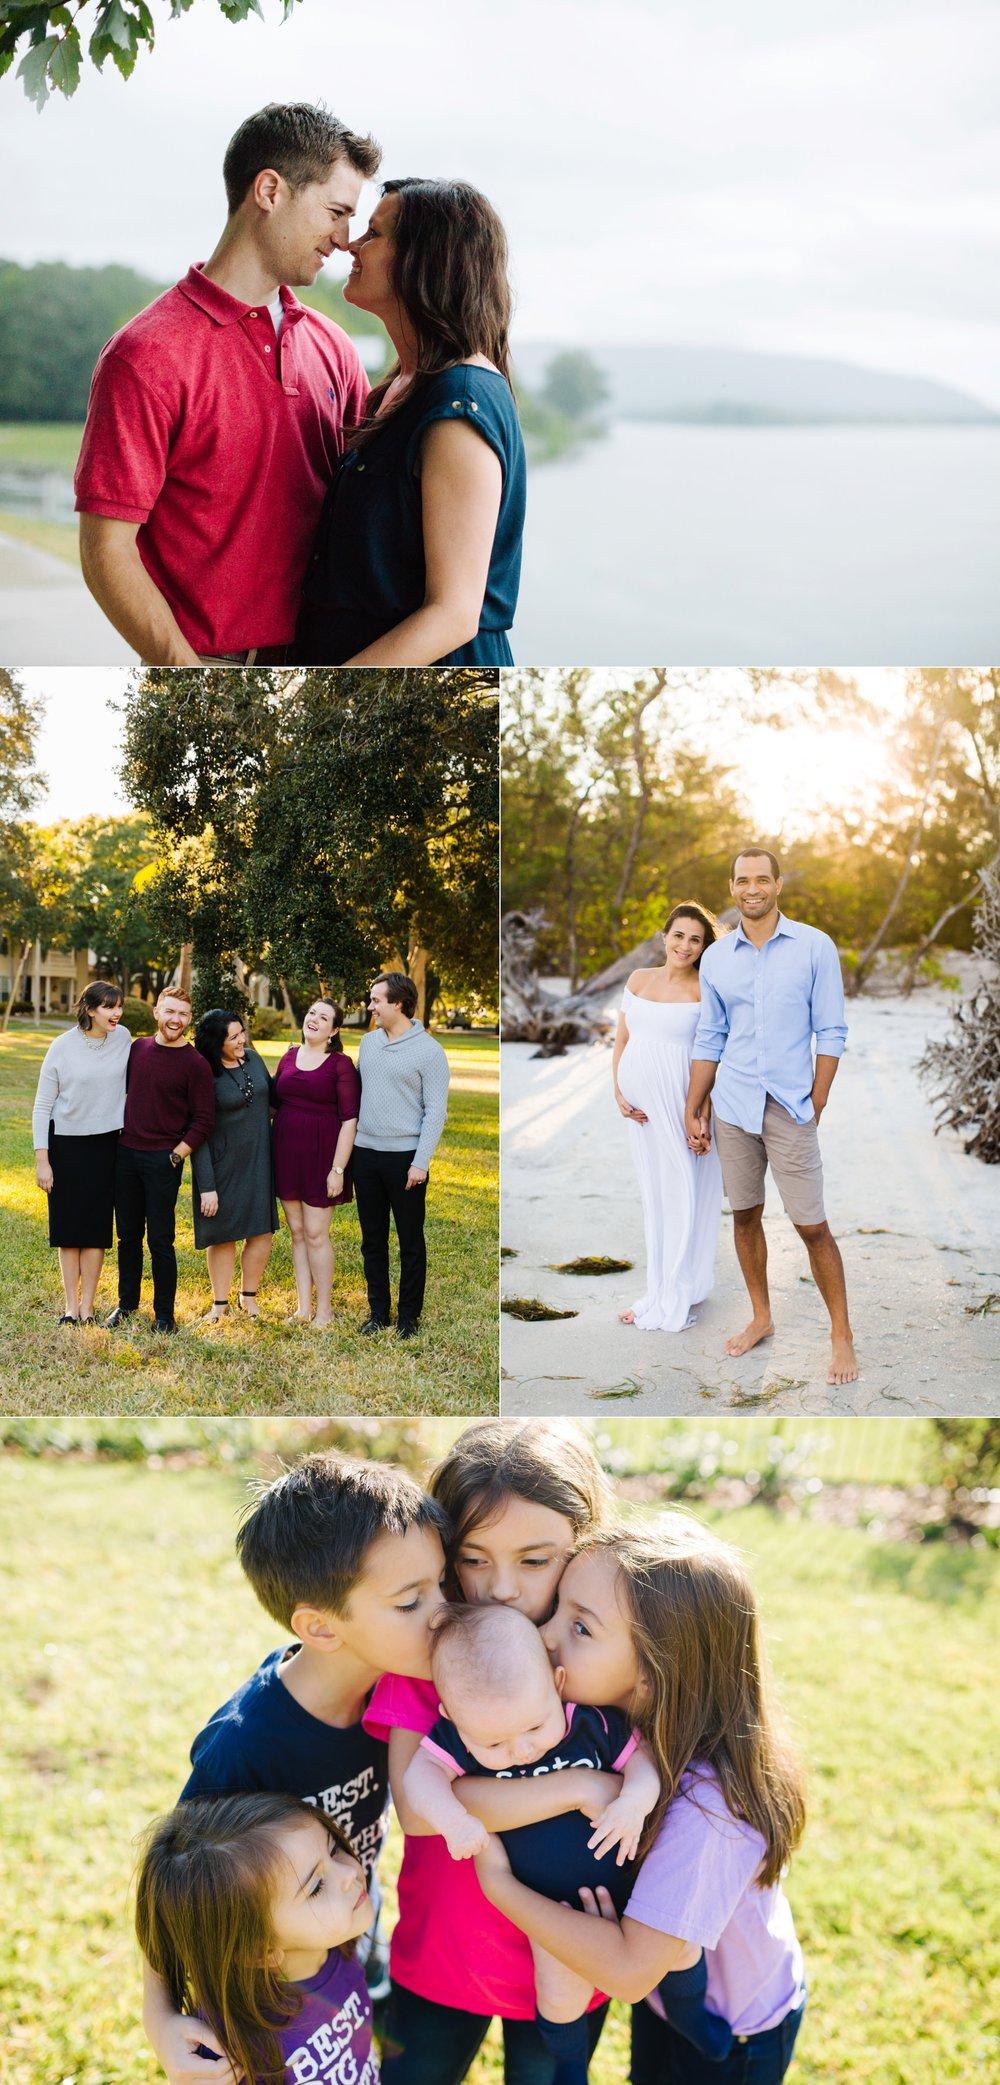 Jake & Katie's Best of Families 2016-020.jpg